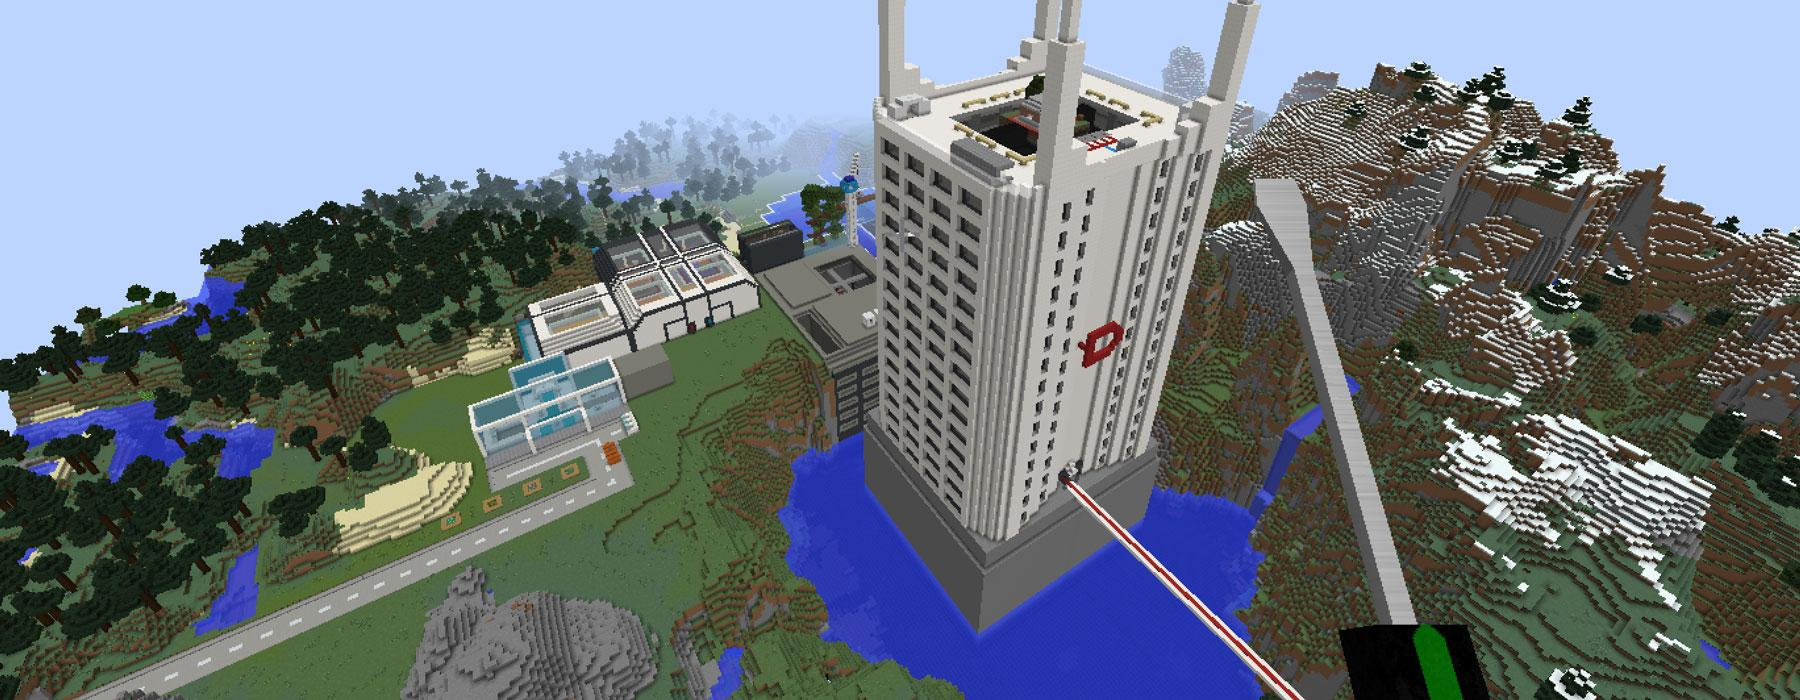 The ShakerMod Minecraft world